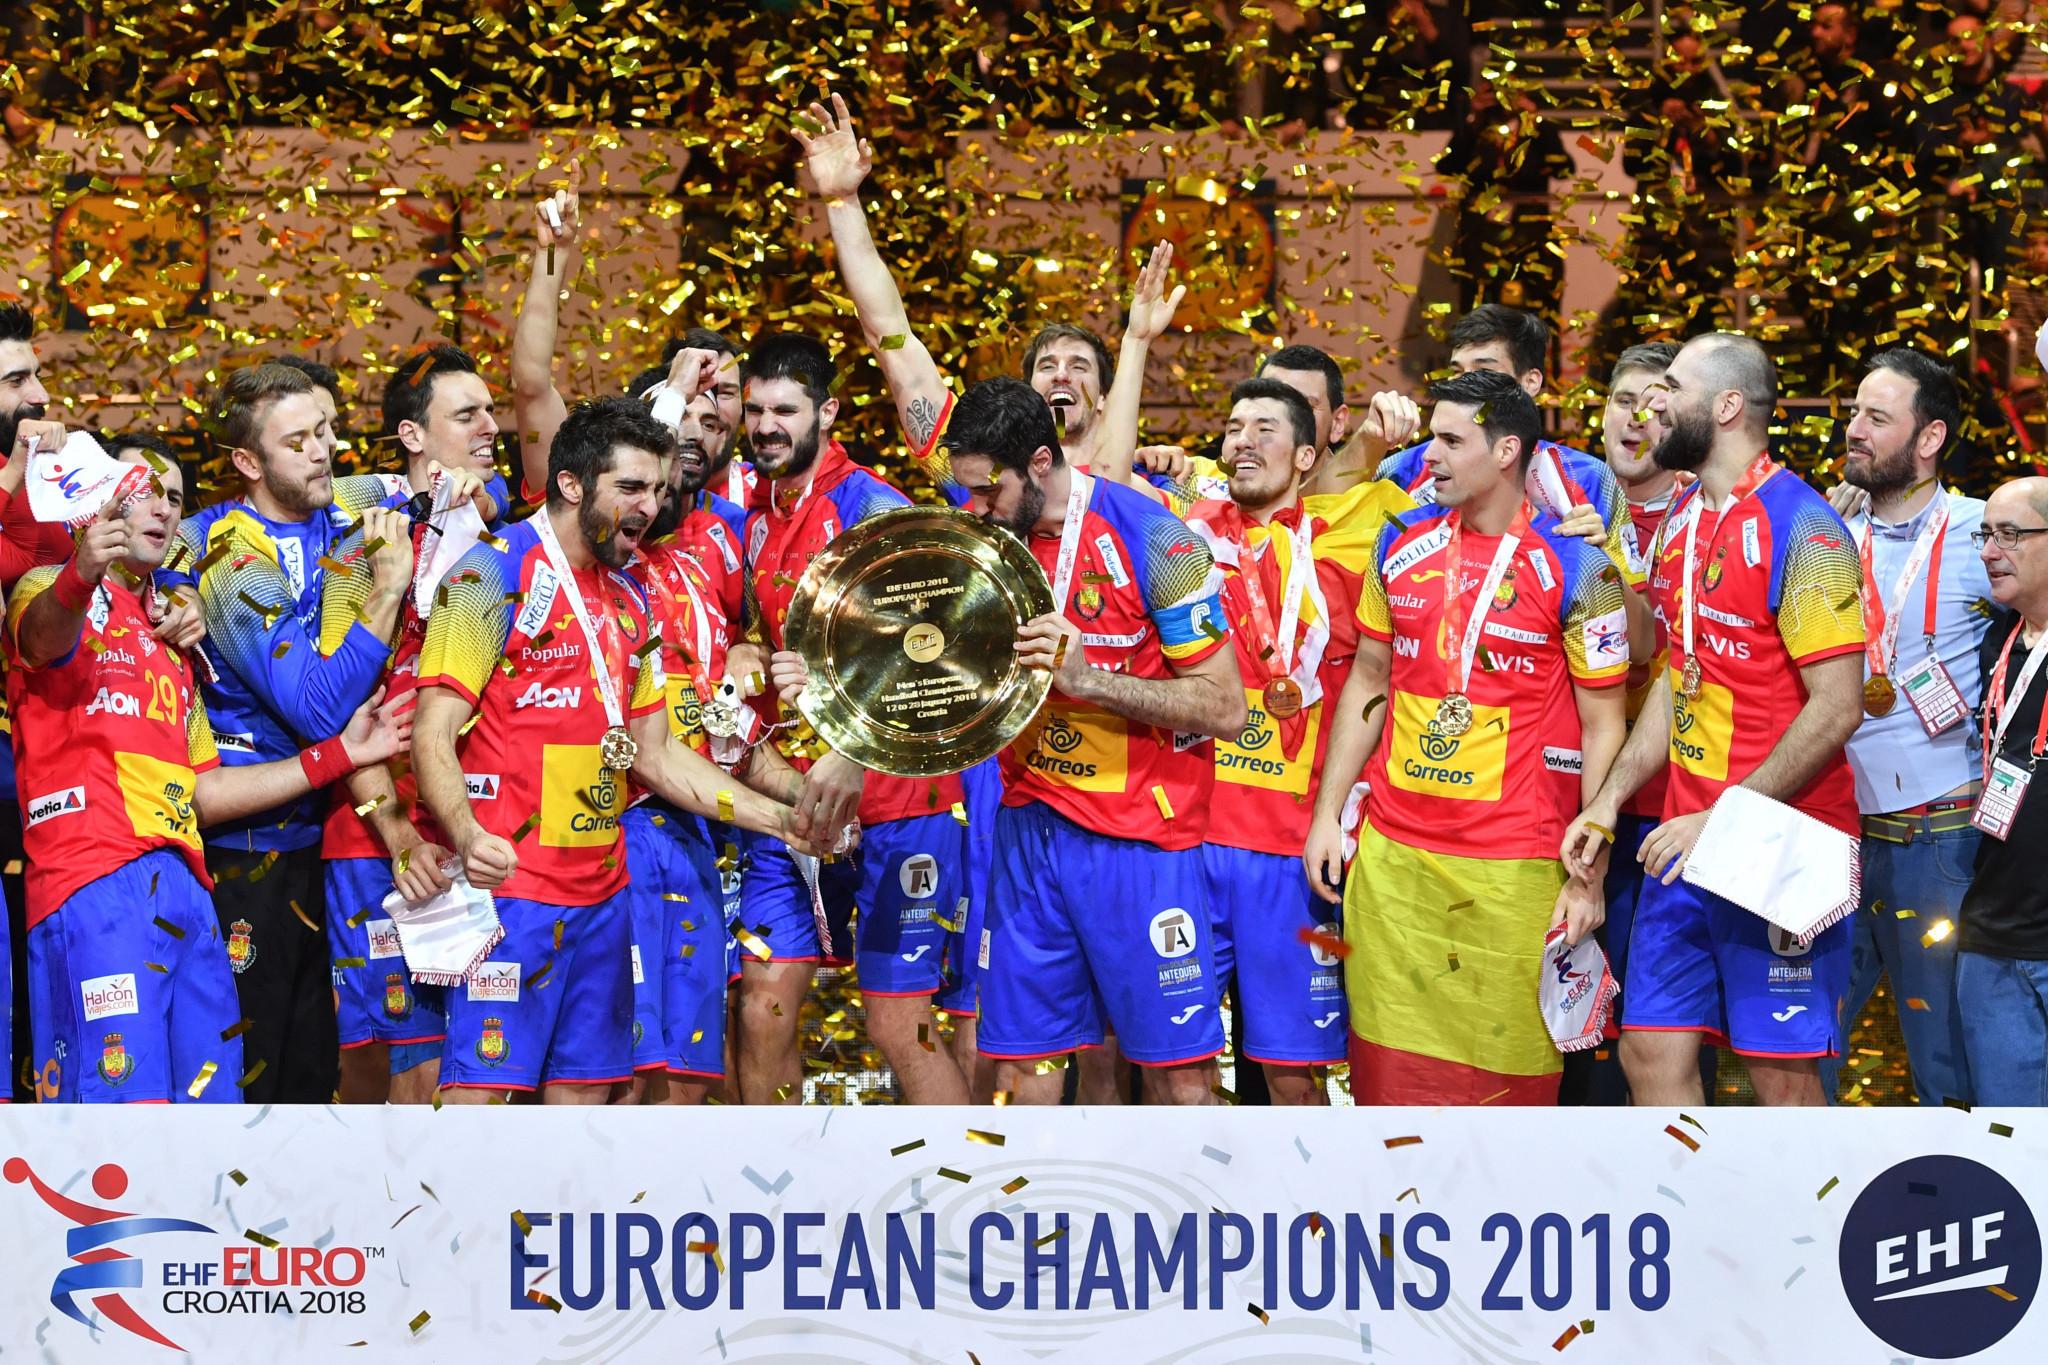 Unibet to sponsor men and women's 2020 EHF European Championships